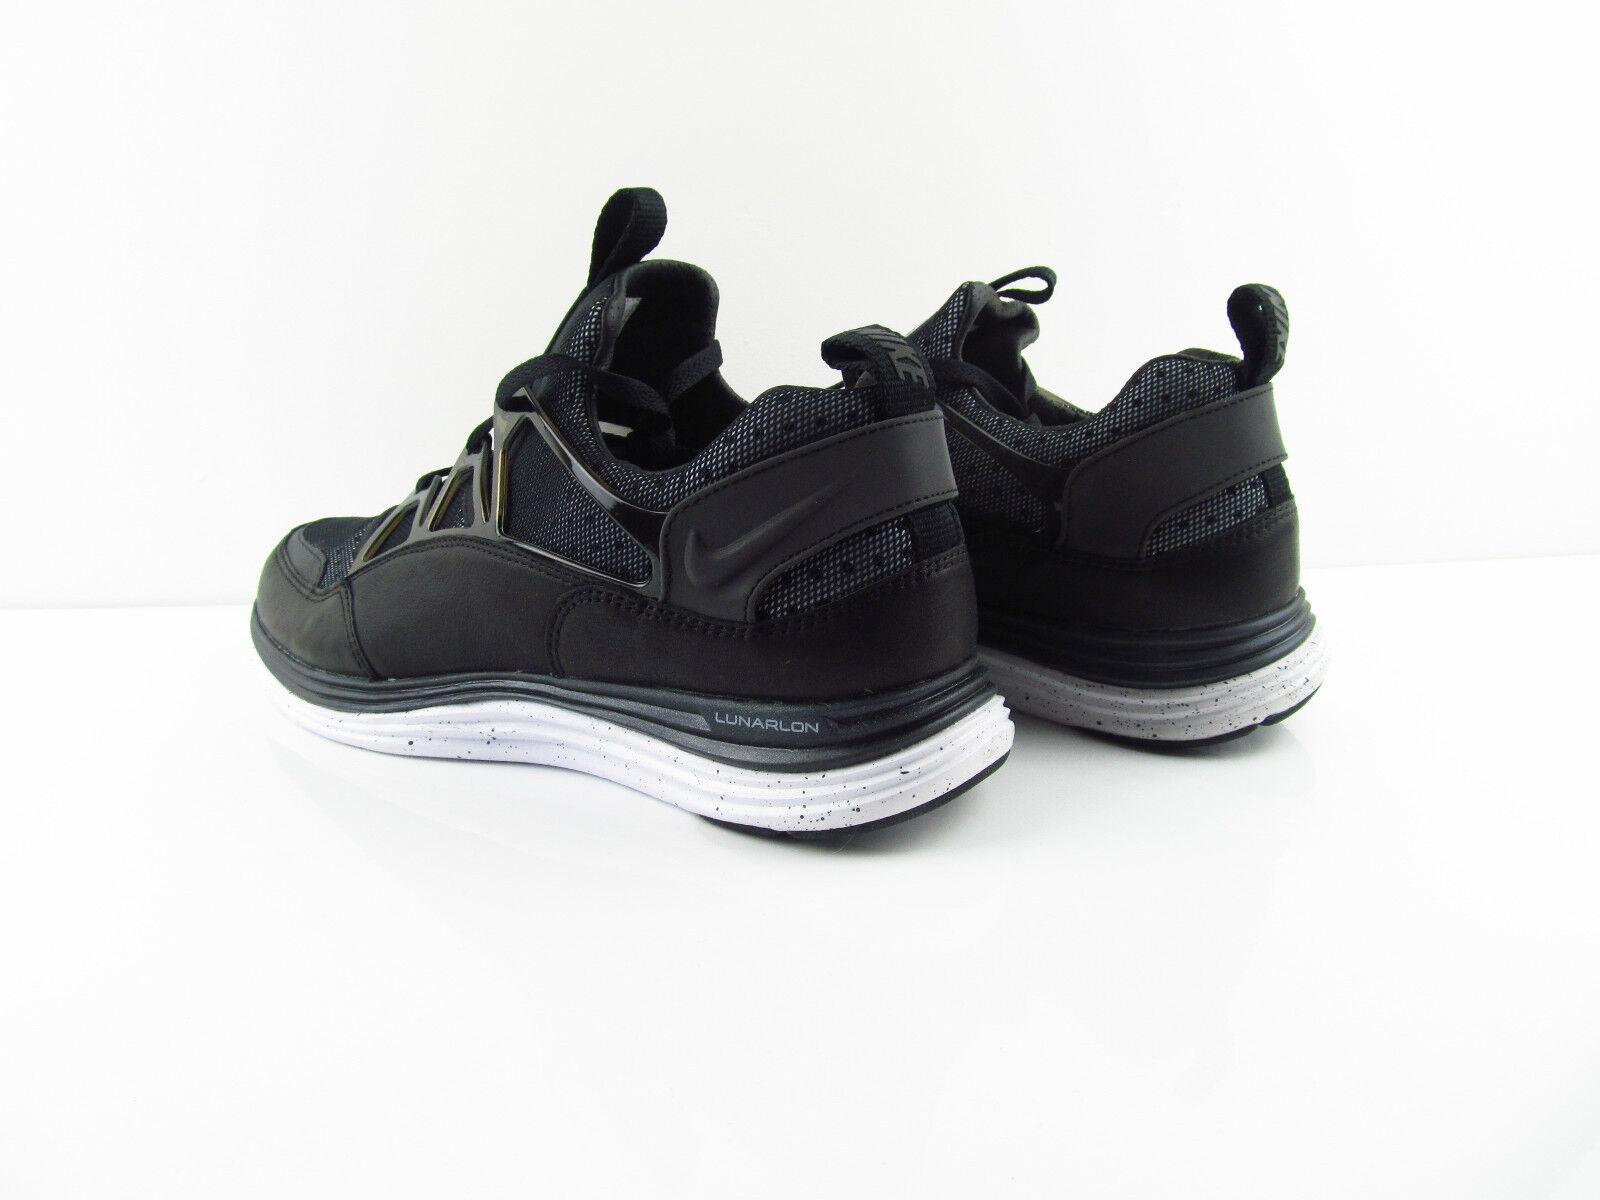 Nike sp lunar huarache light sp Nike nikelab negro New us_11 13 euros 45 - 47.5 1060bb